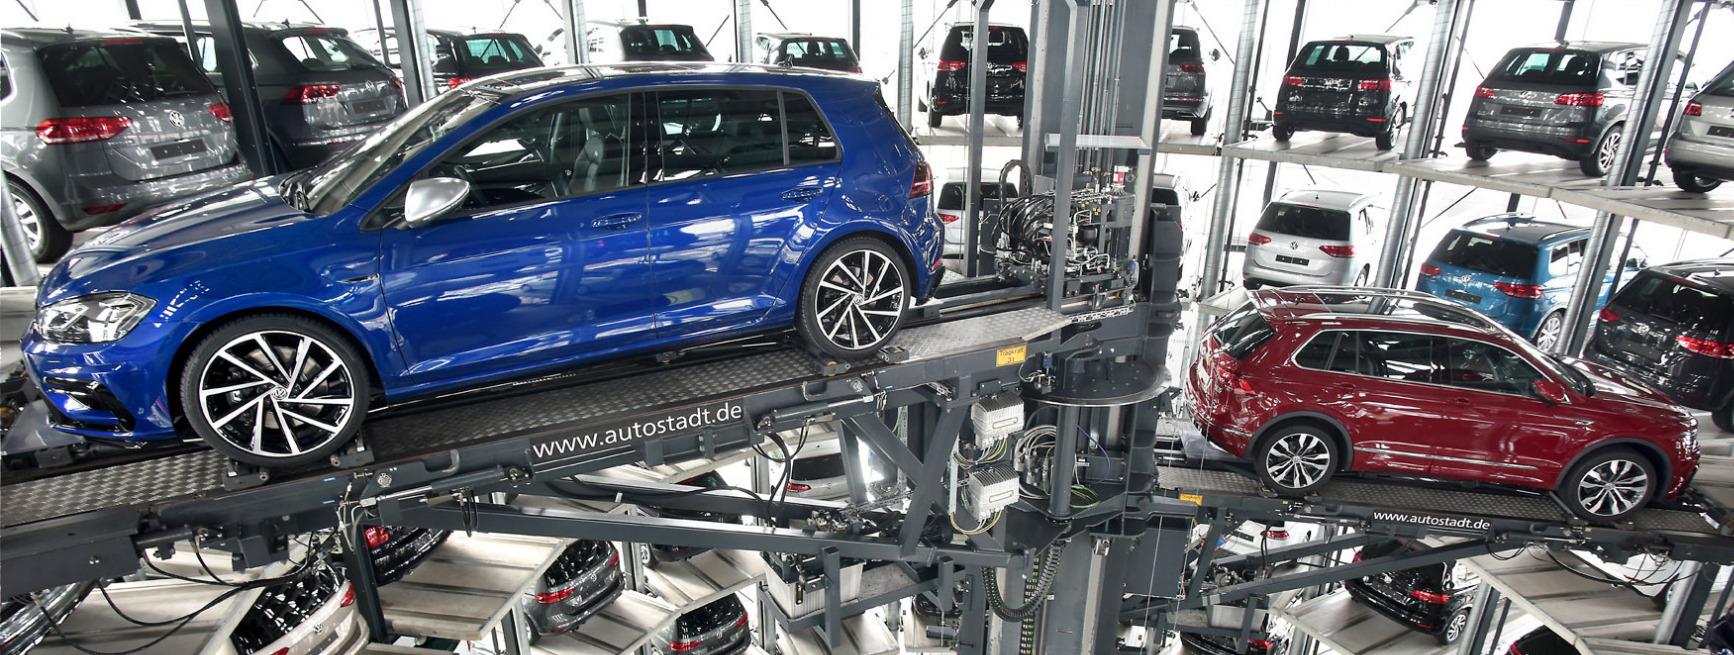 Fuente: Volkswagen